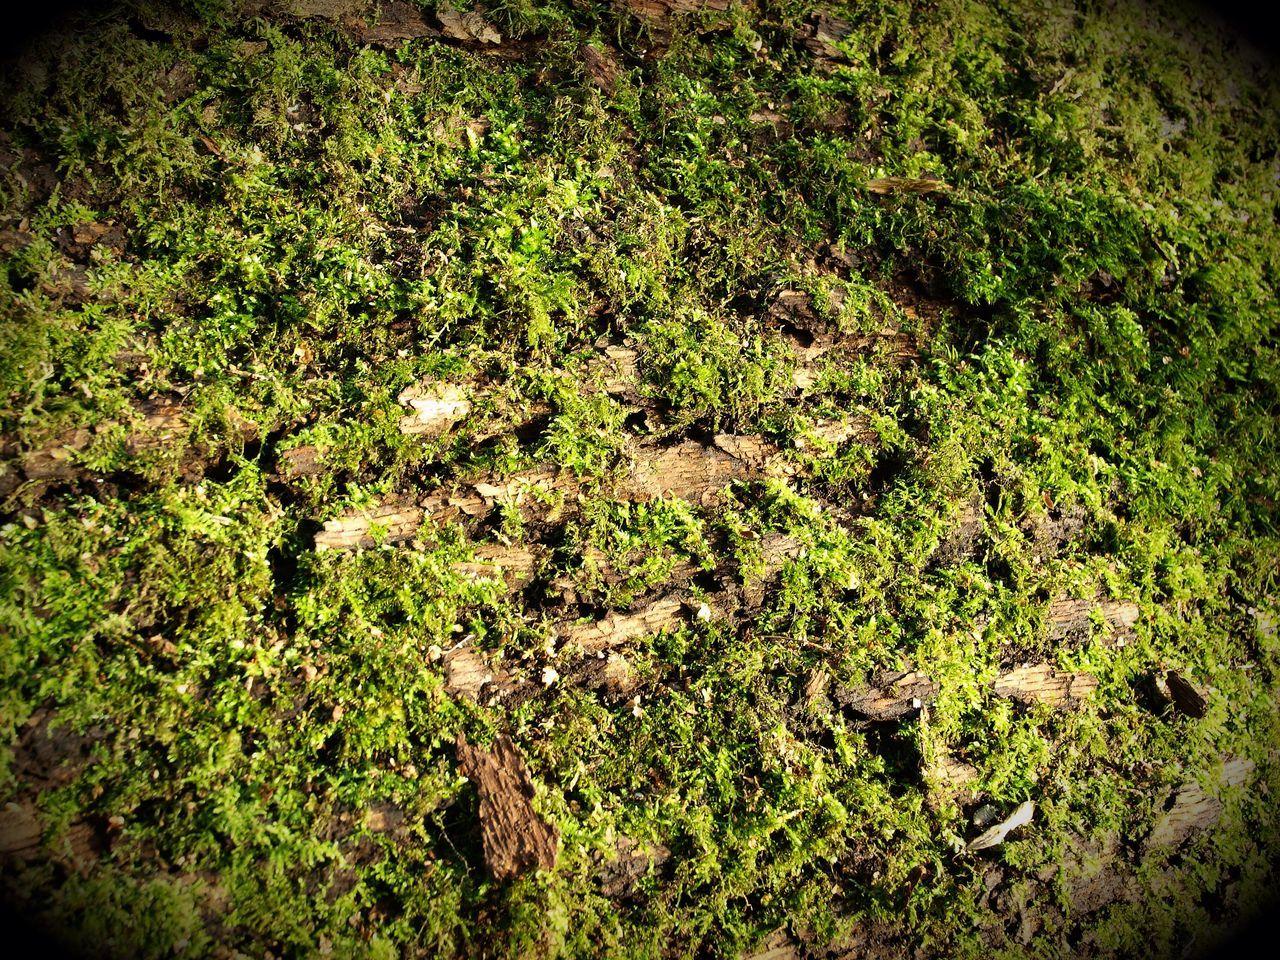 More moss Hampstead Heath Stevesevilempire Olympus London Green Color Nature Outdoors Zuiko Tree Trunk Steve Merrick